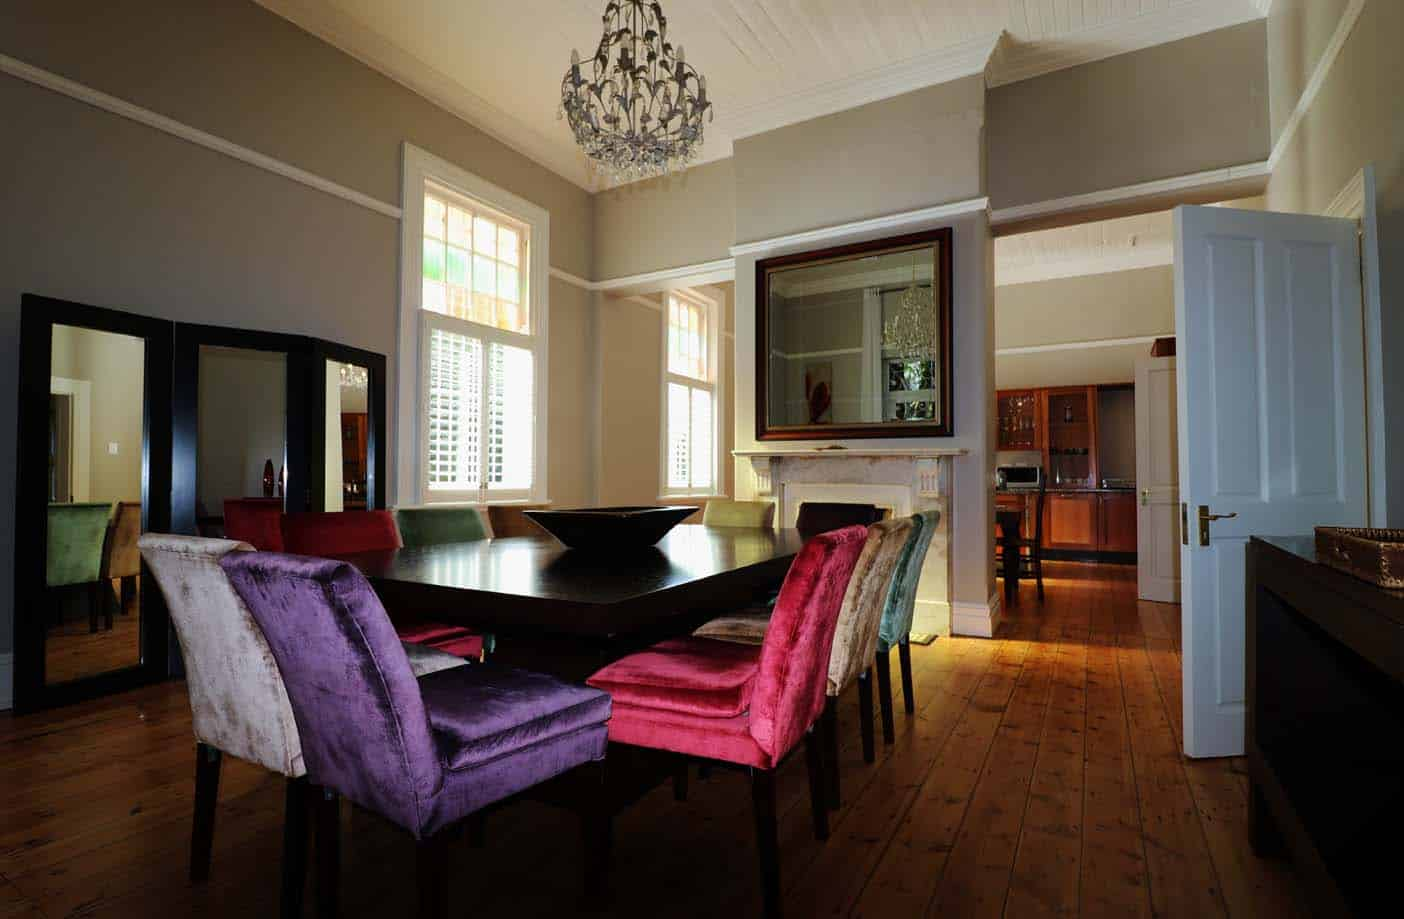 kindvriendelijk hotel kaapstad More Quarters Cape Town